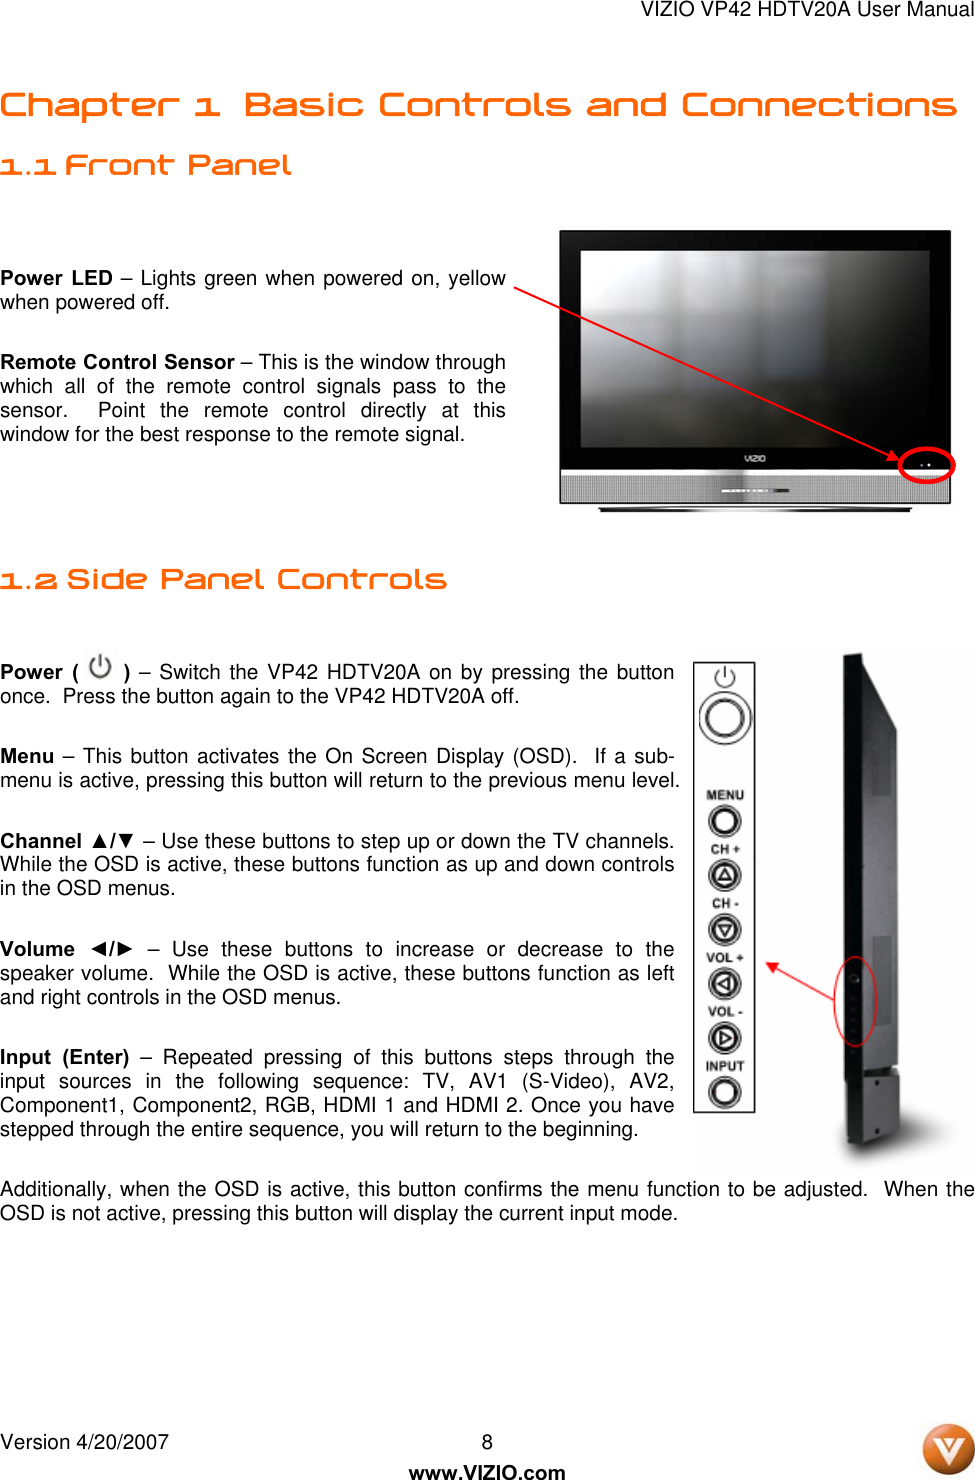 Vizio Vp42 Users Manual